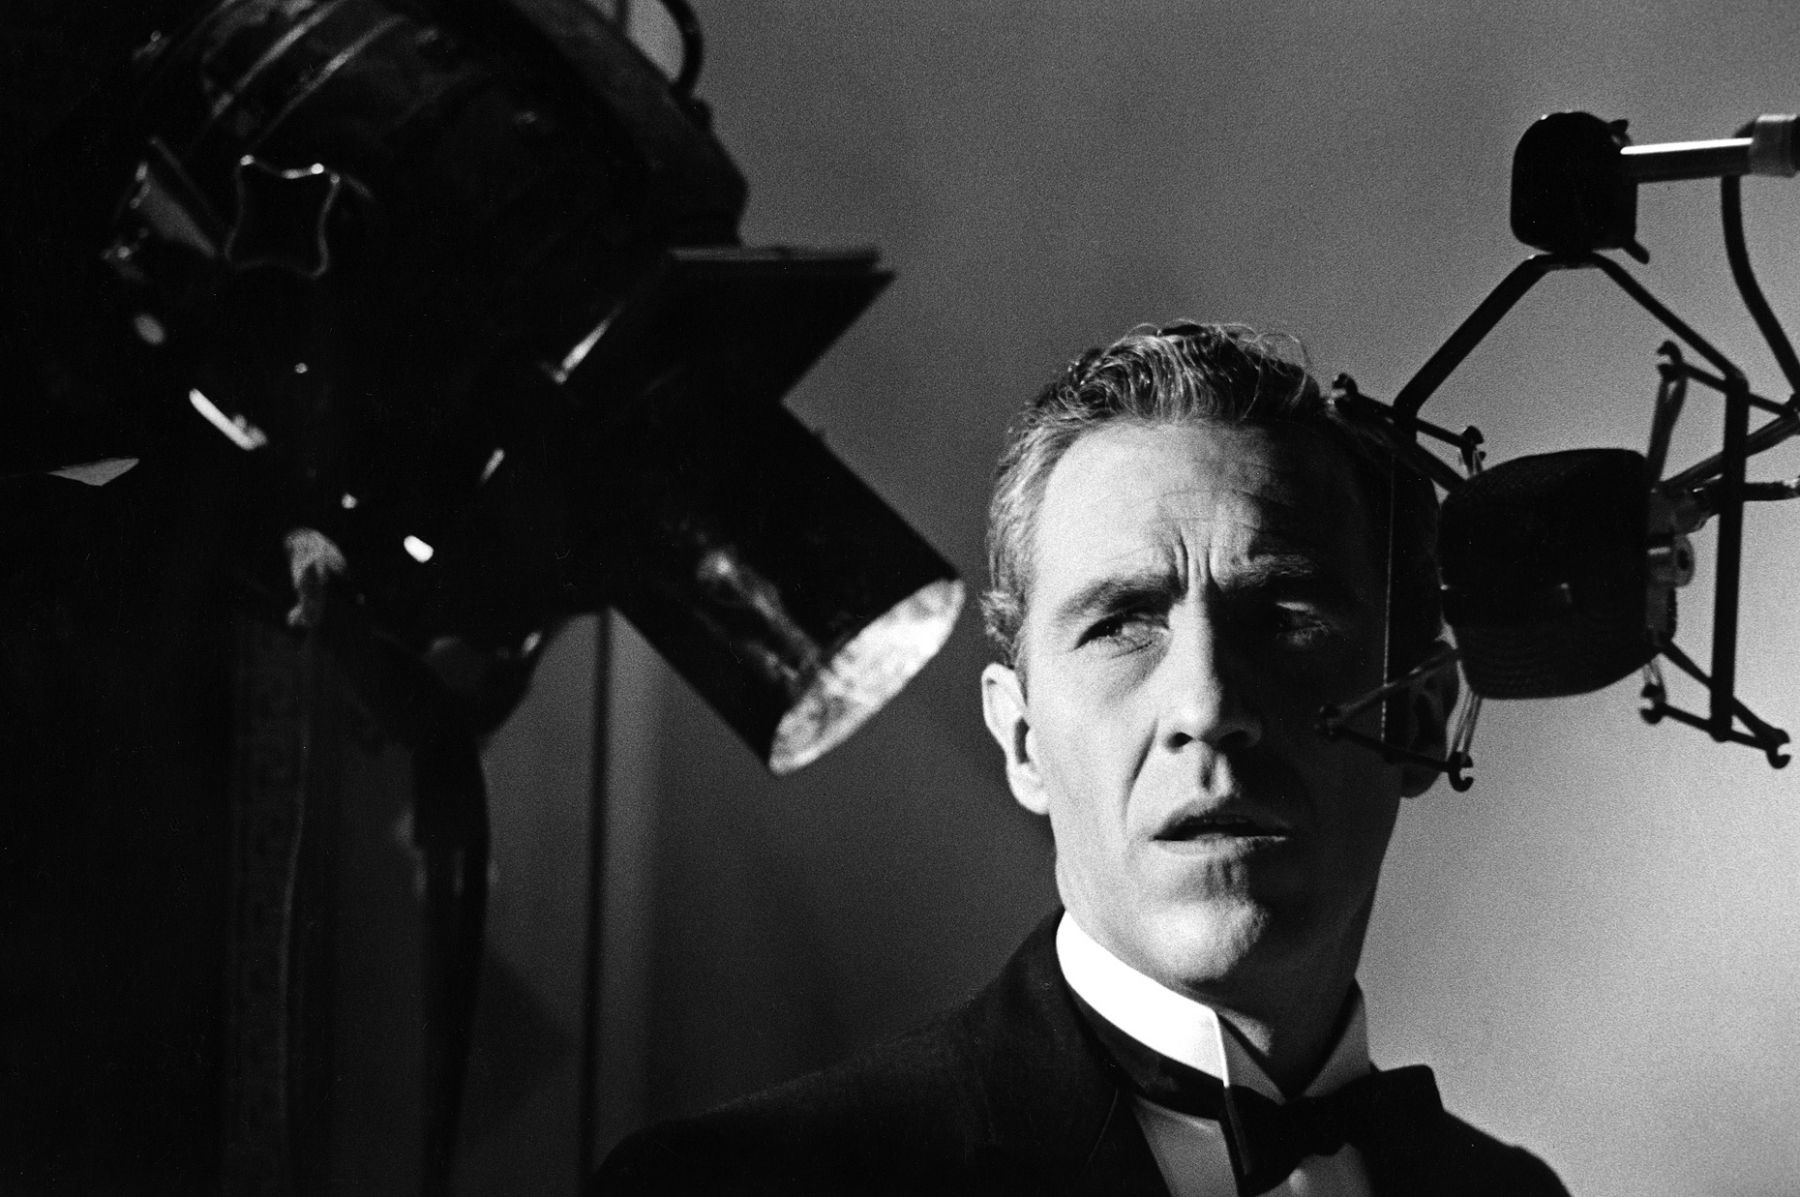 Jason Robards on set of Tender is the Night, 20th Century Fox, 1961.